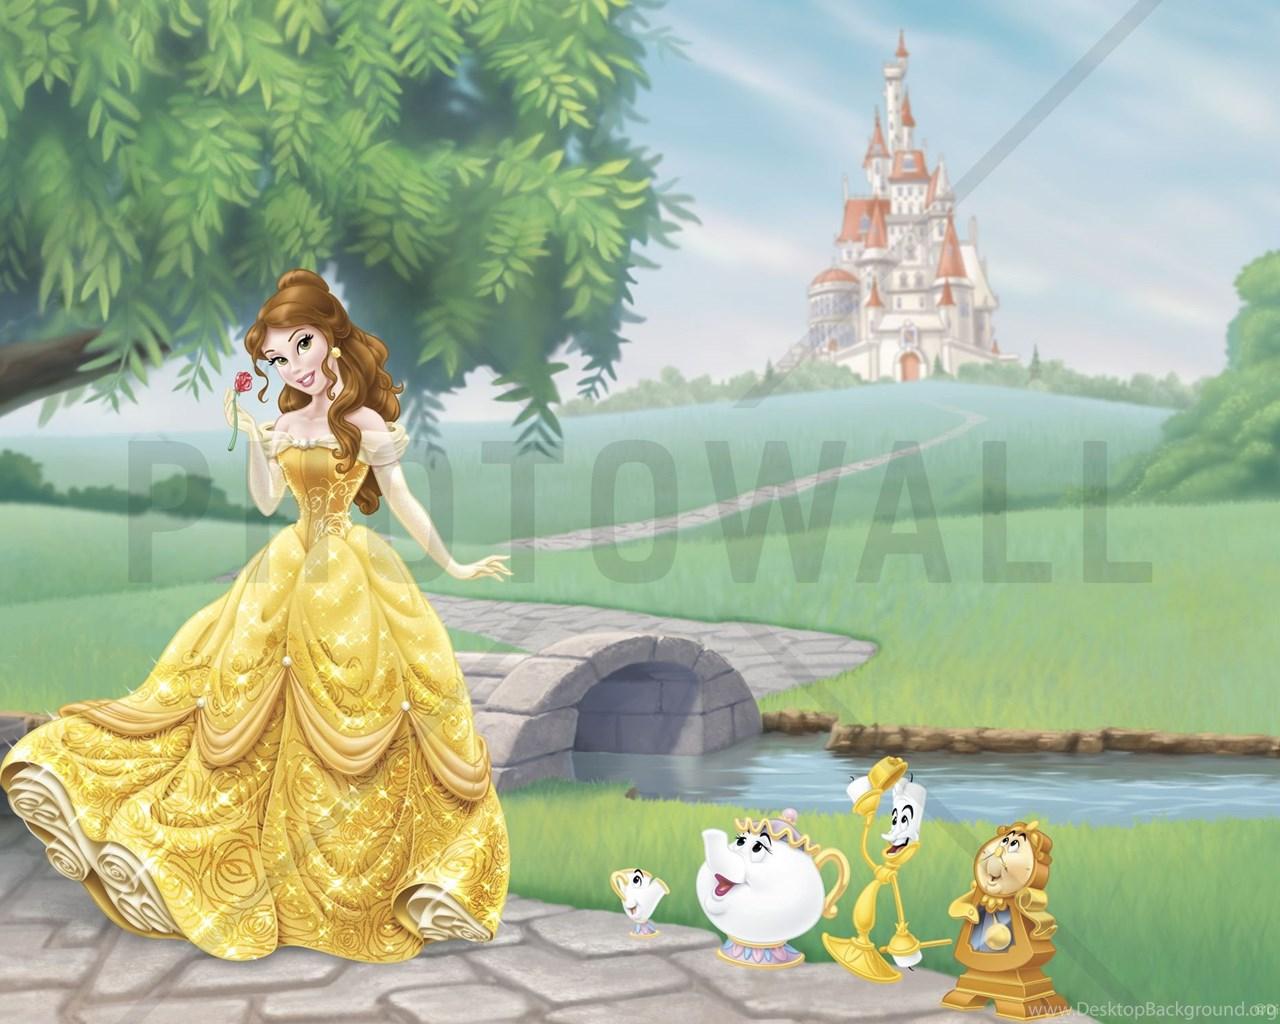 Disney Princess Belle Wall Mural Photo Wallpapers Photowall Desktop Background